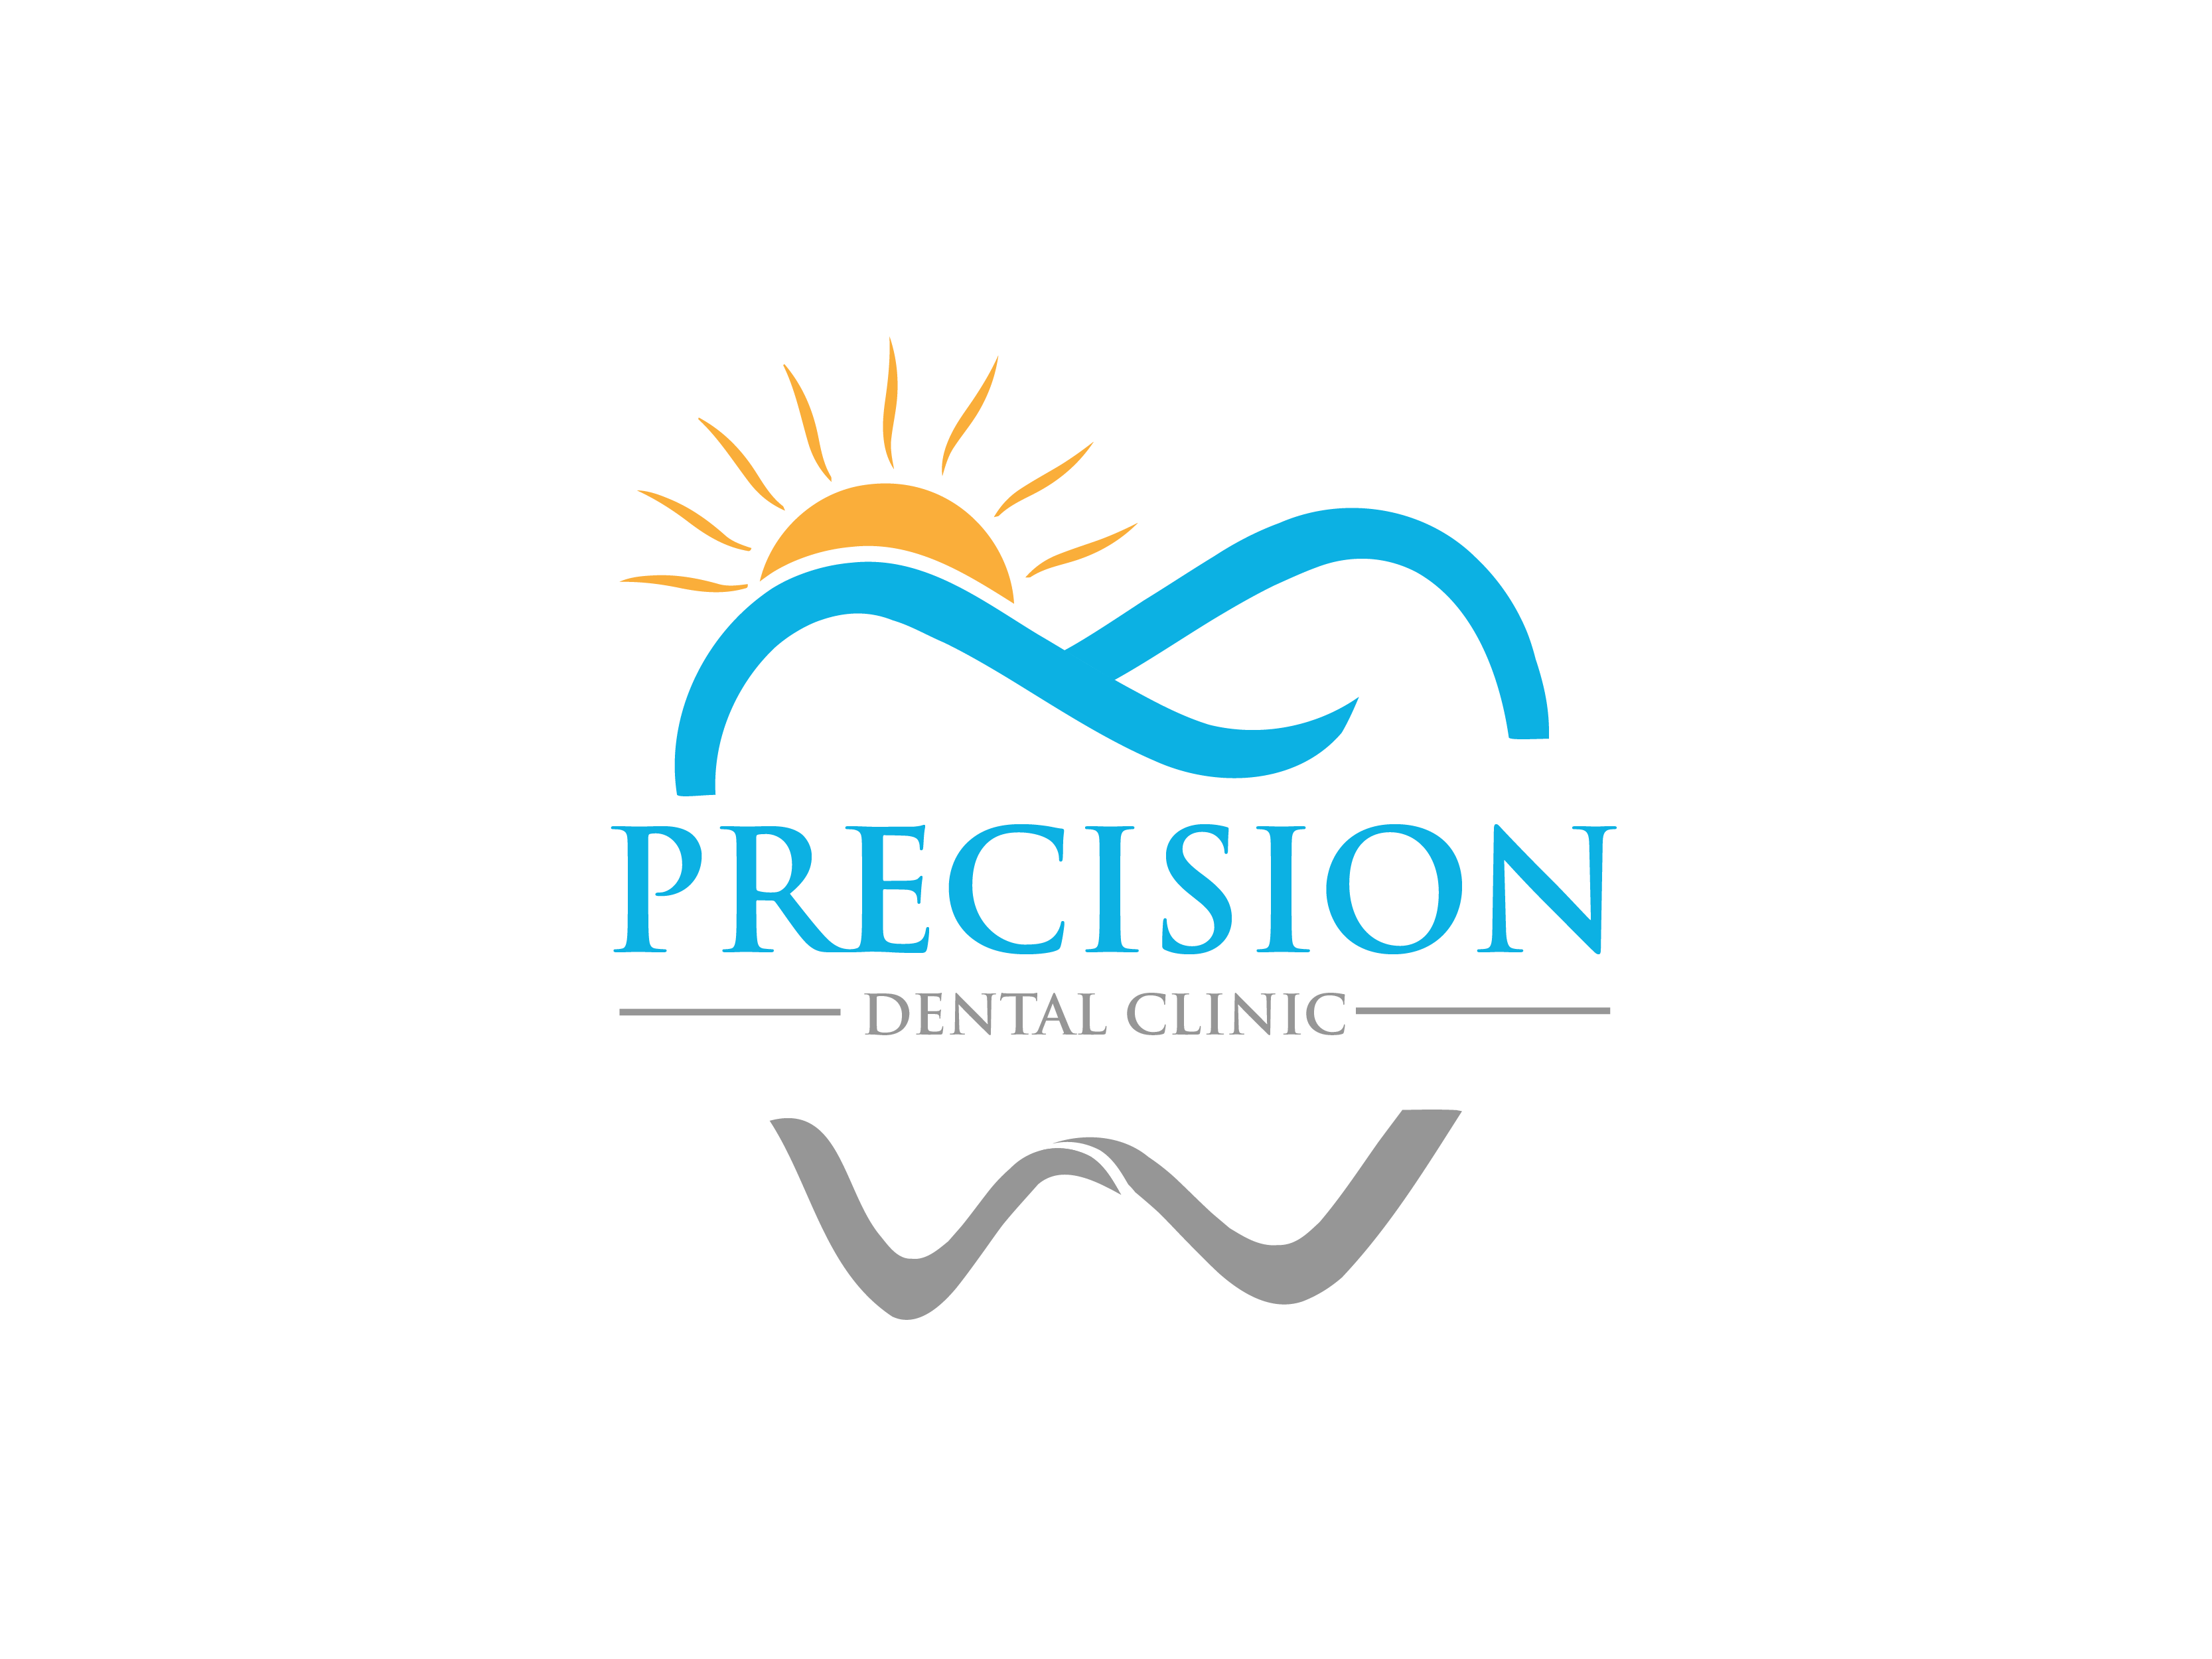 Logo Design by Private User - Entry No. 174 in the Logo Design Contest Captivating Logo Design for Precision Dental Clinic.